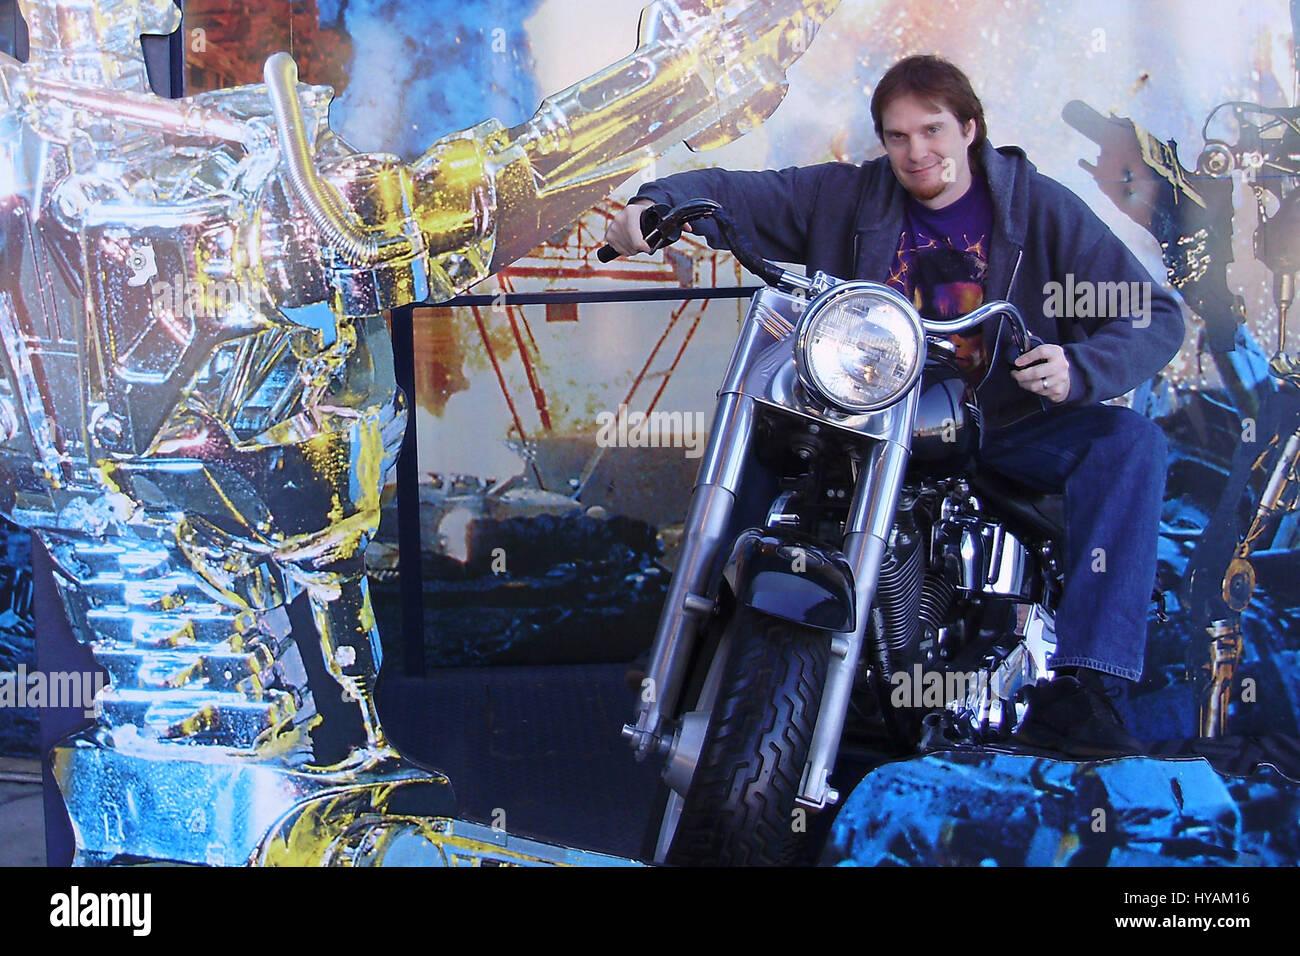 SACREMENTO, CALIFORNIA: Schwarzeneggar superfan Randy Jennings outside UNiversal Studios replica Terminator 2 Harley - Stock Image